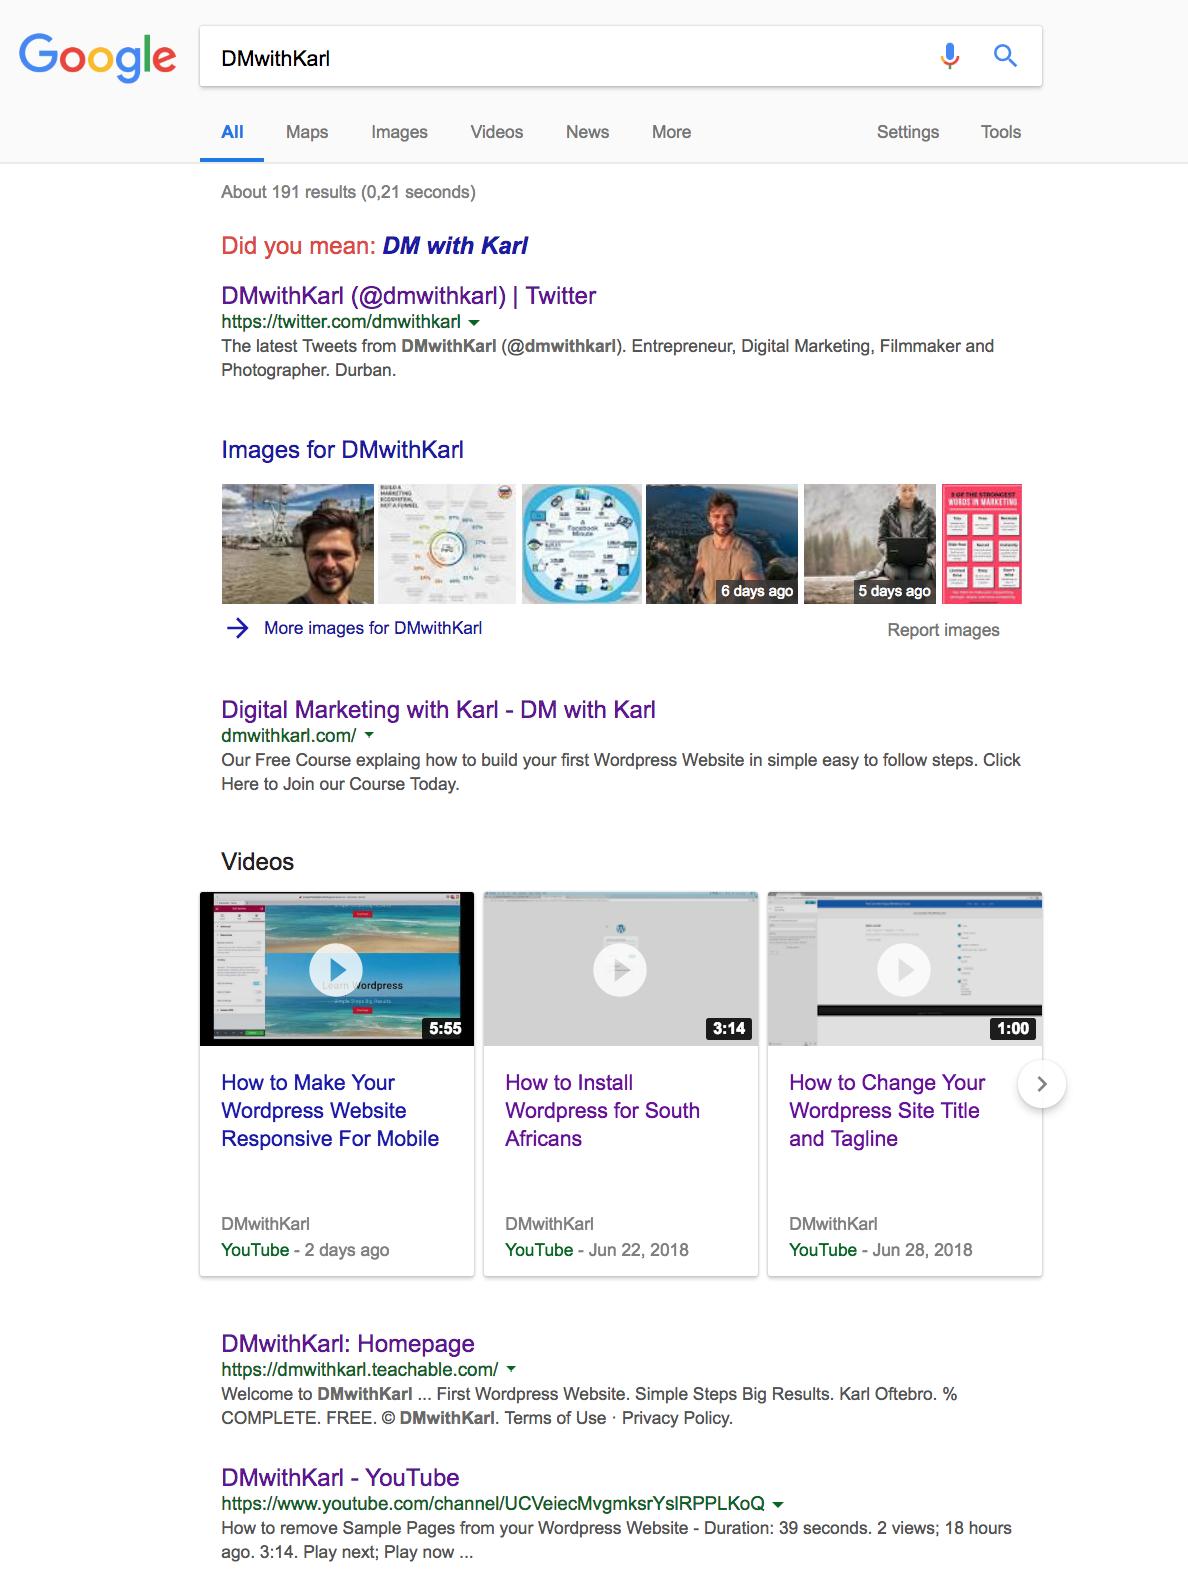 Google DM with Karl Digital Marketing